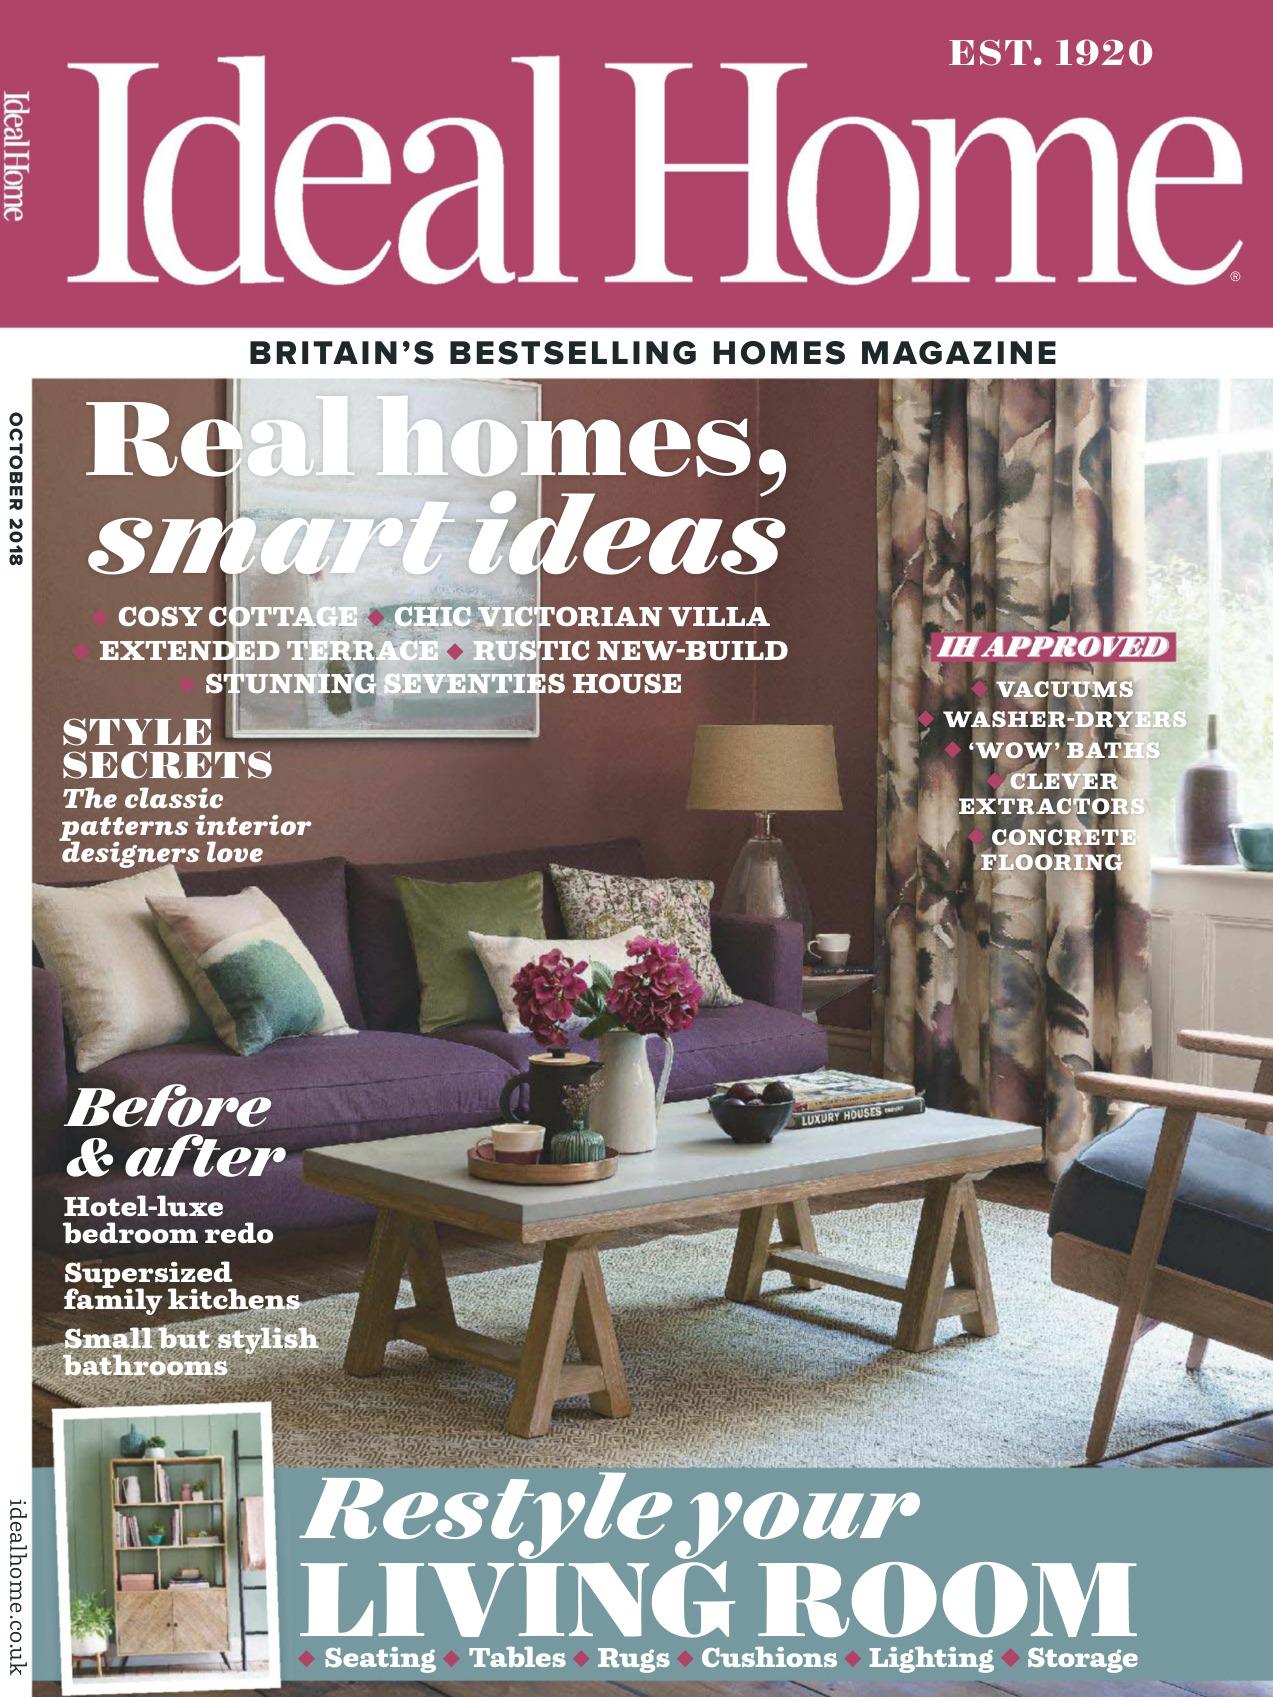 《Ideal Home》英国版理想的家园杂志2018年10月号